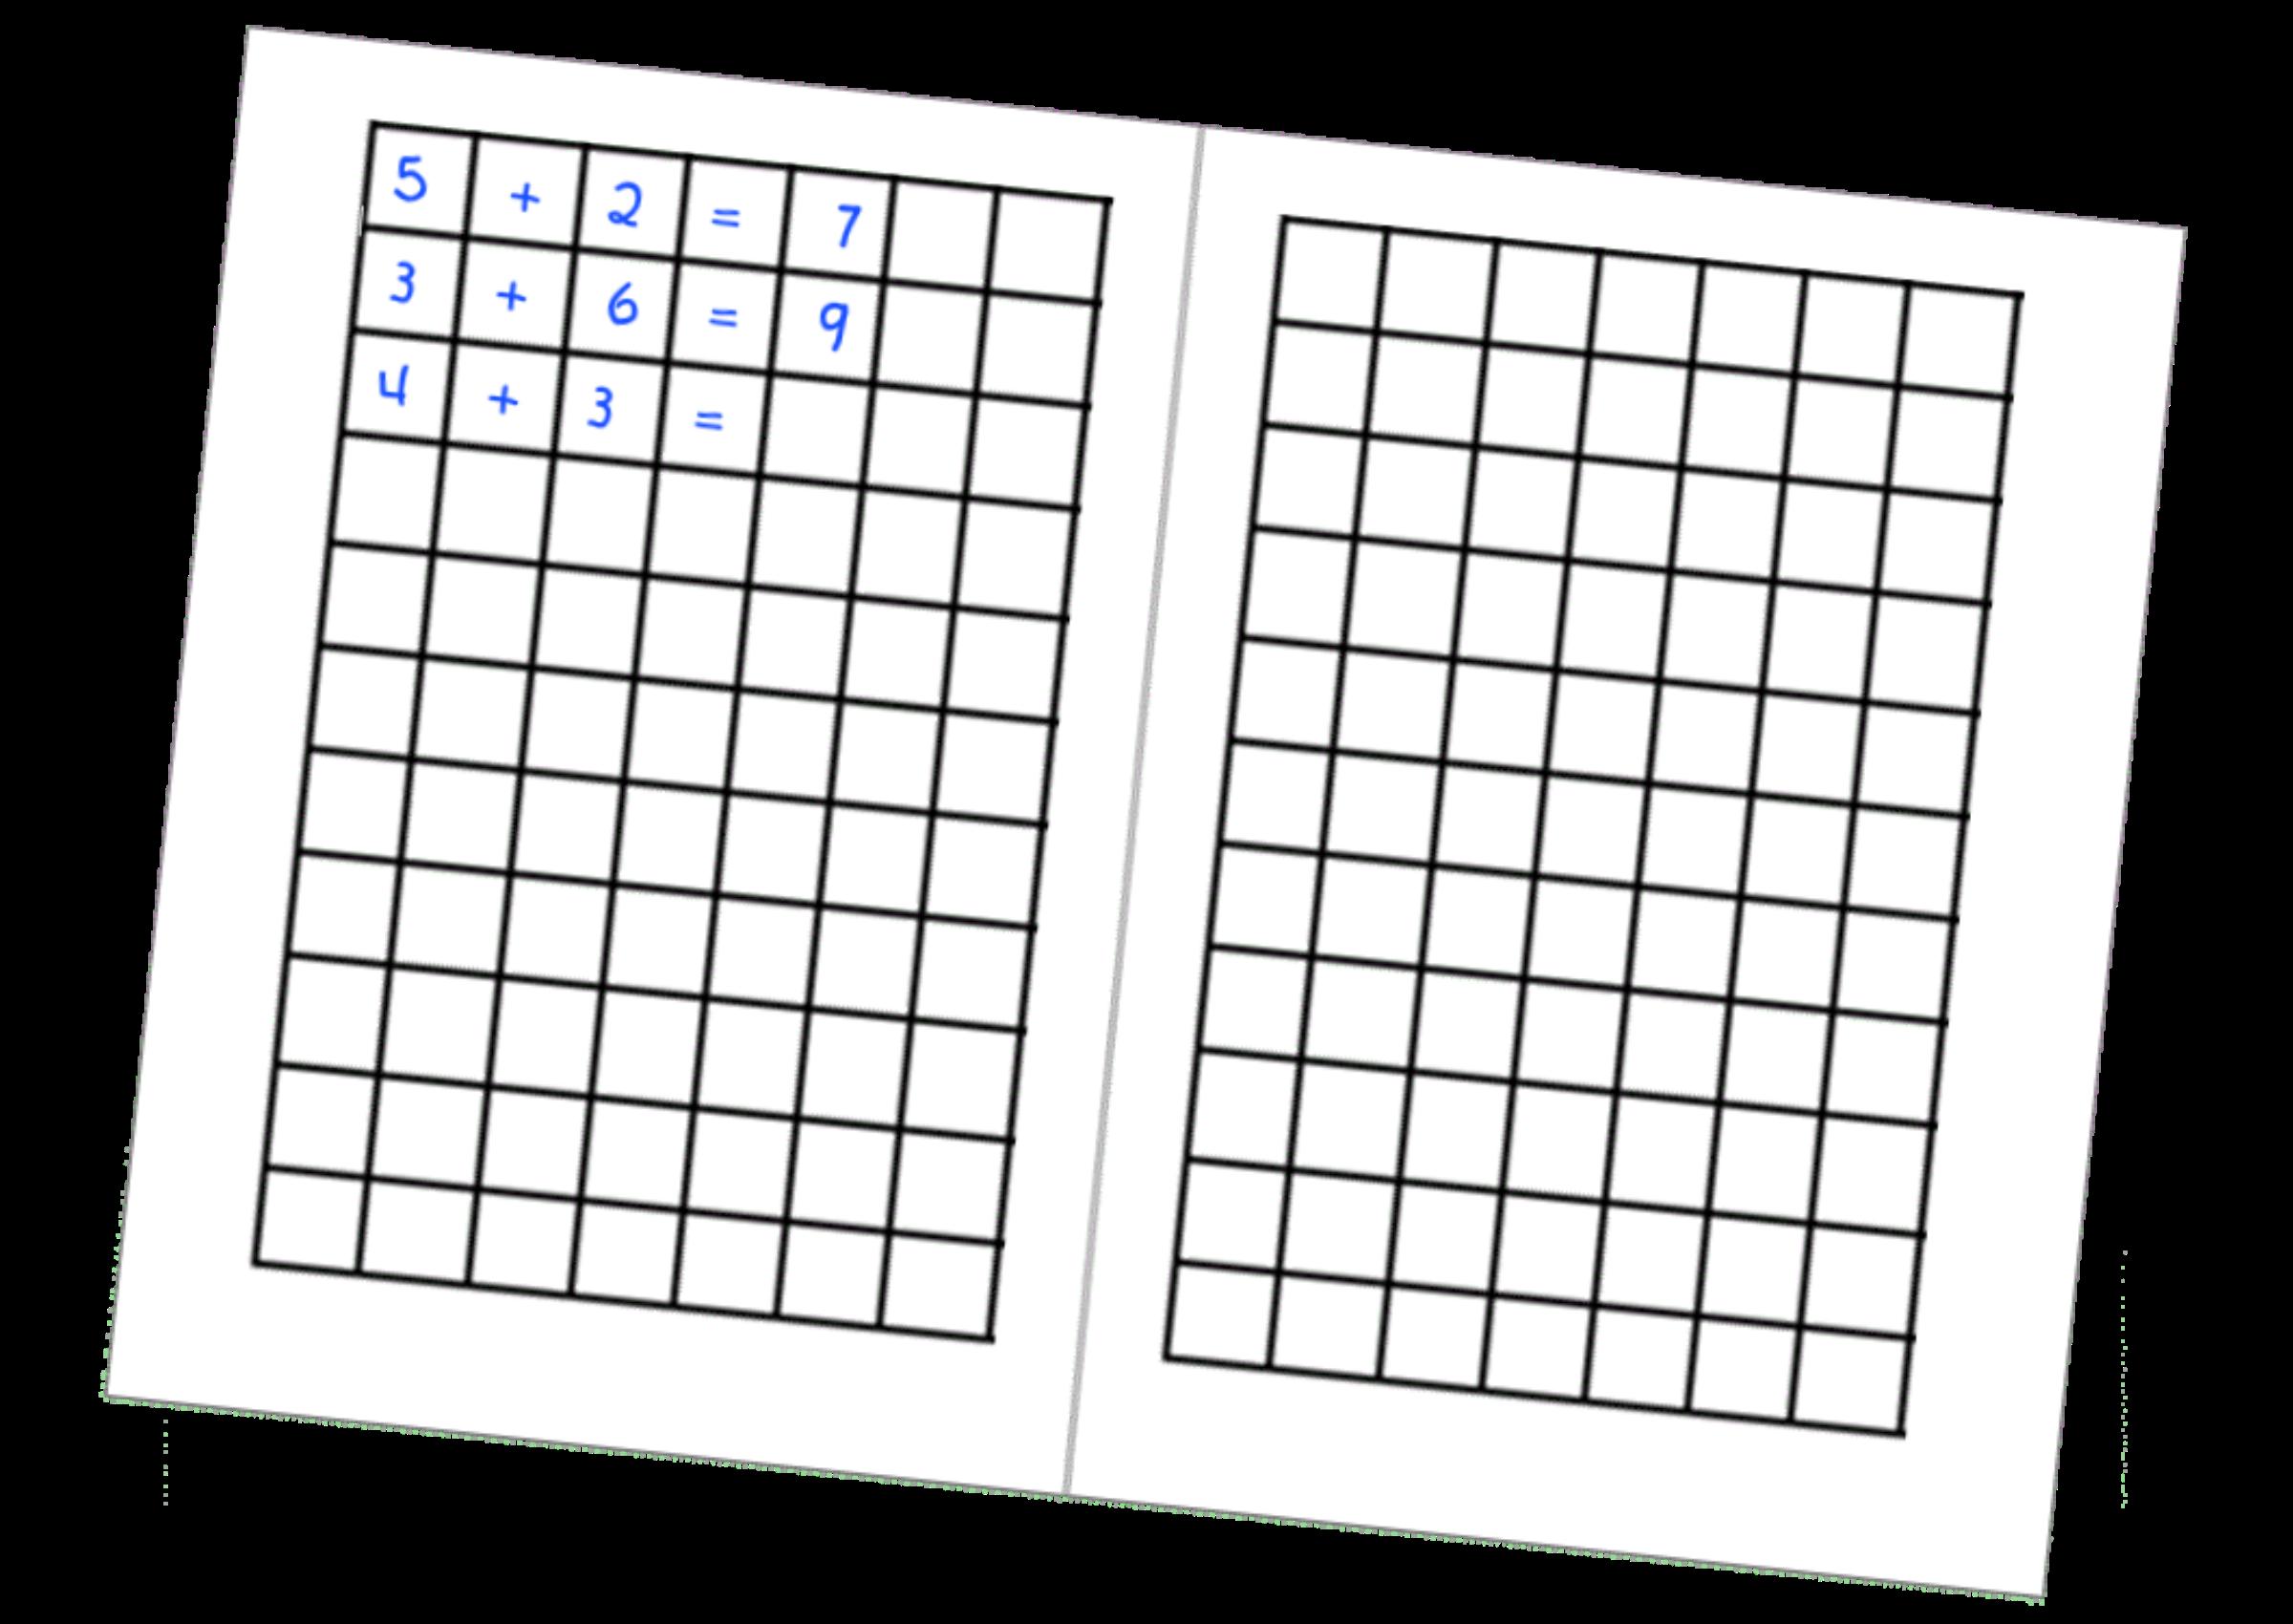 Clipart calendar math. German grid big image